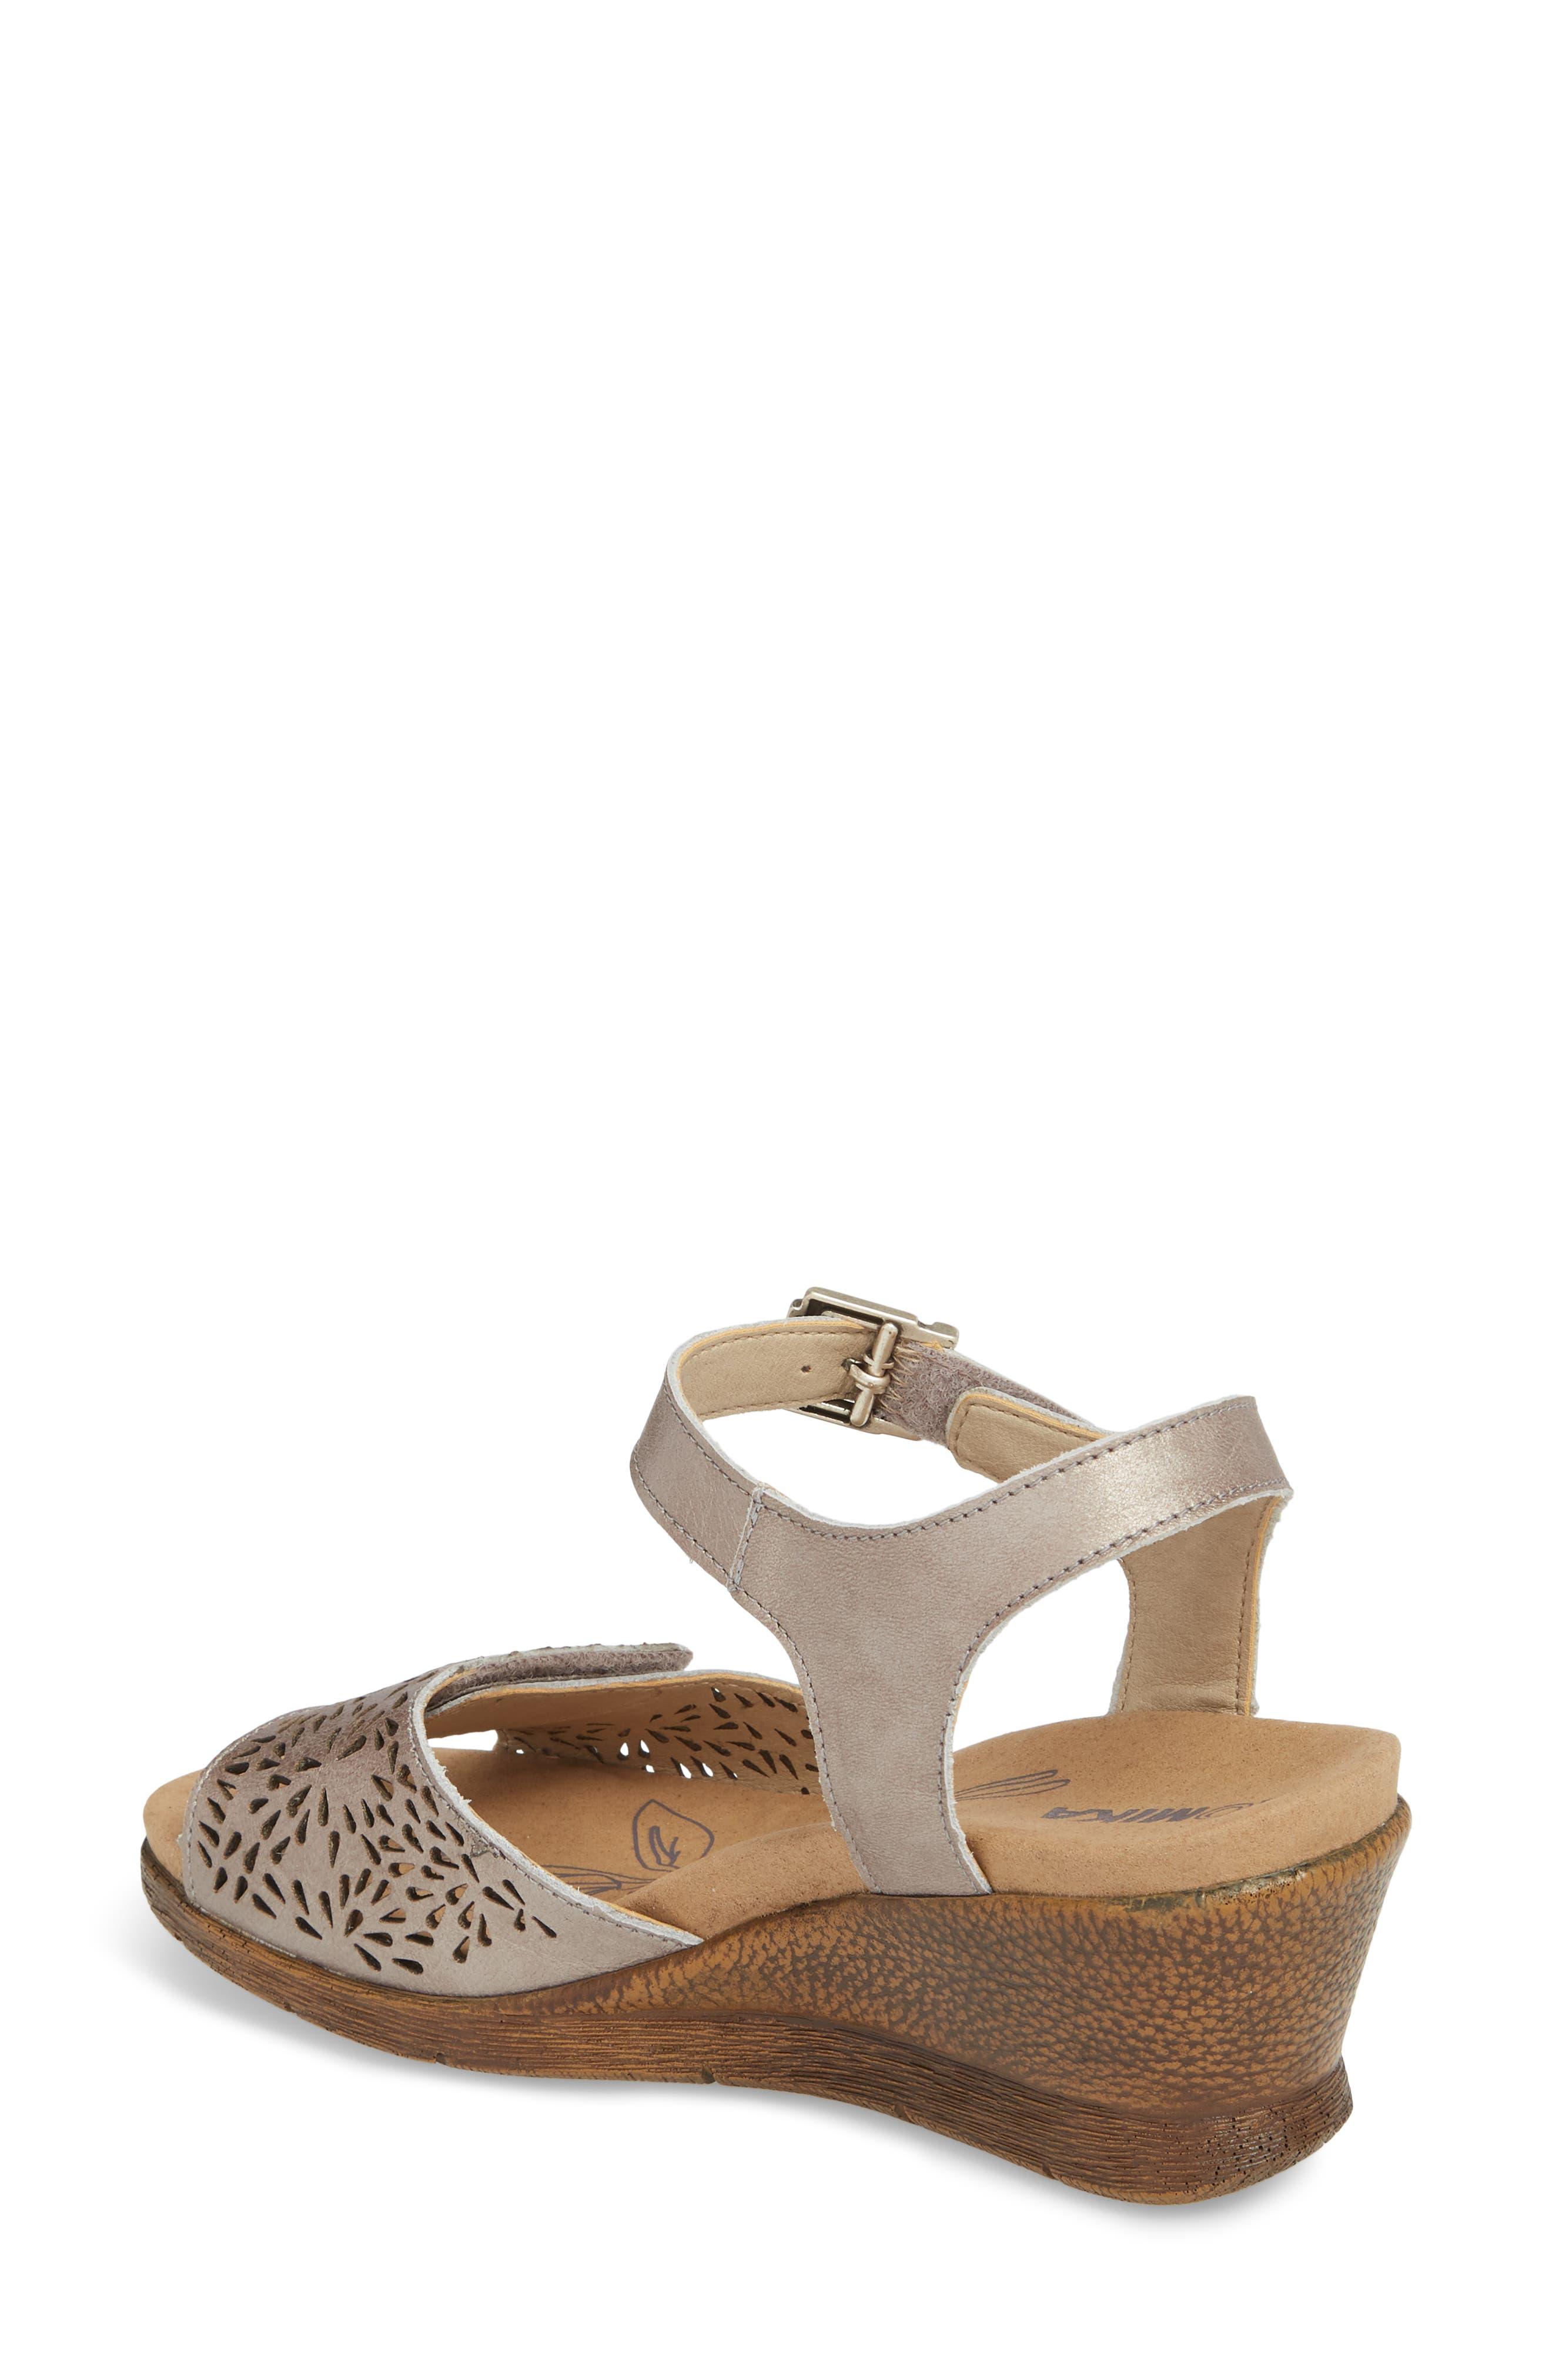 Nevis 05 Sandal,                             Alternate thumbnail 2, color,                             Platinum Leather